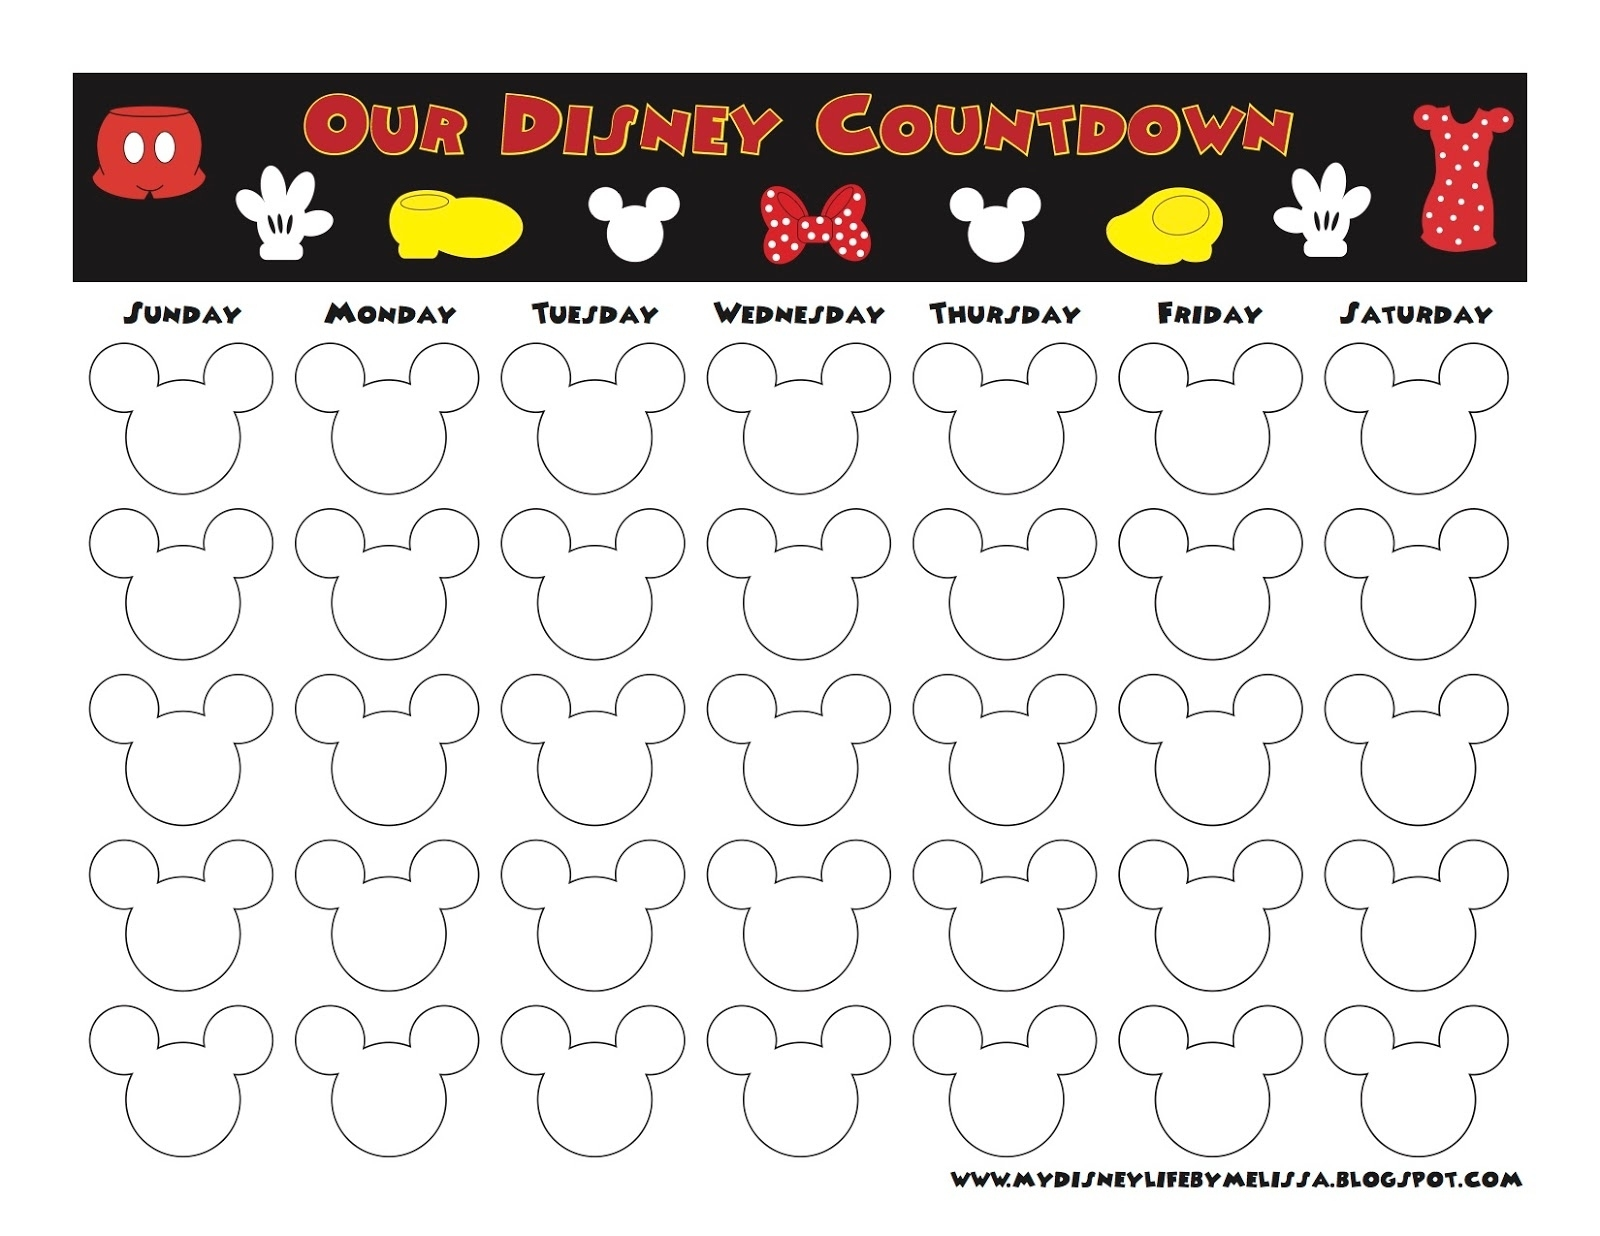 My Disney Life: Countdown Calendars Printable Count Down To Disney